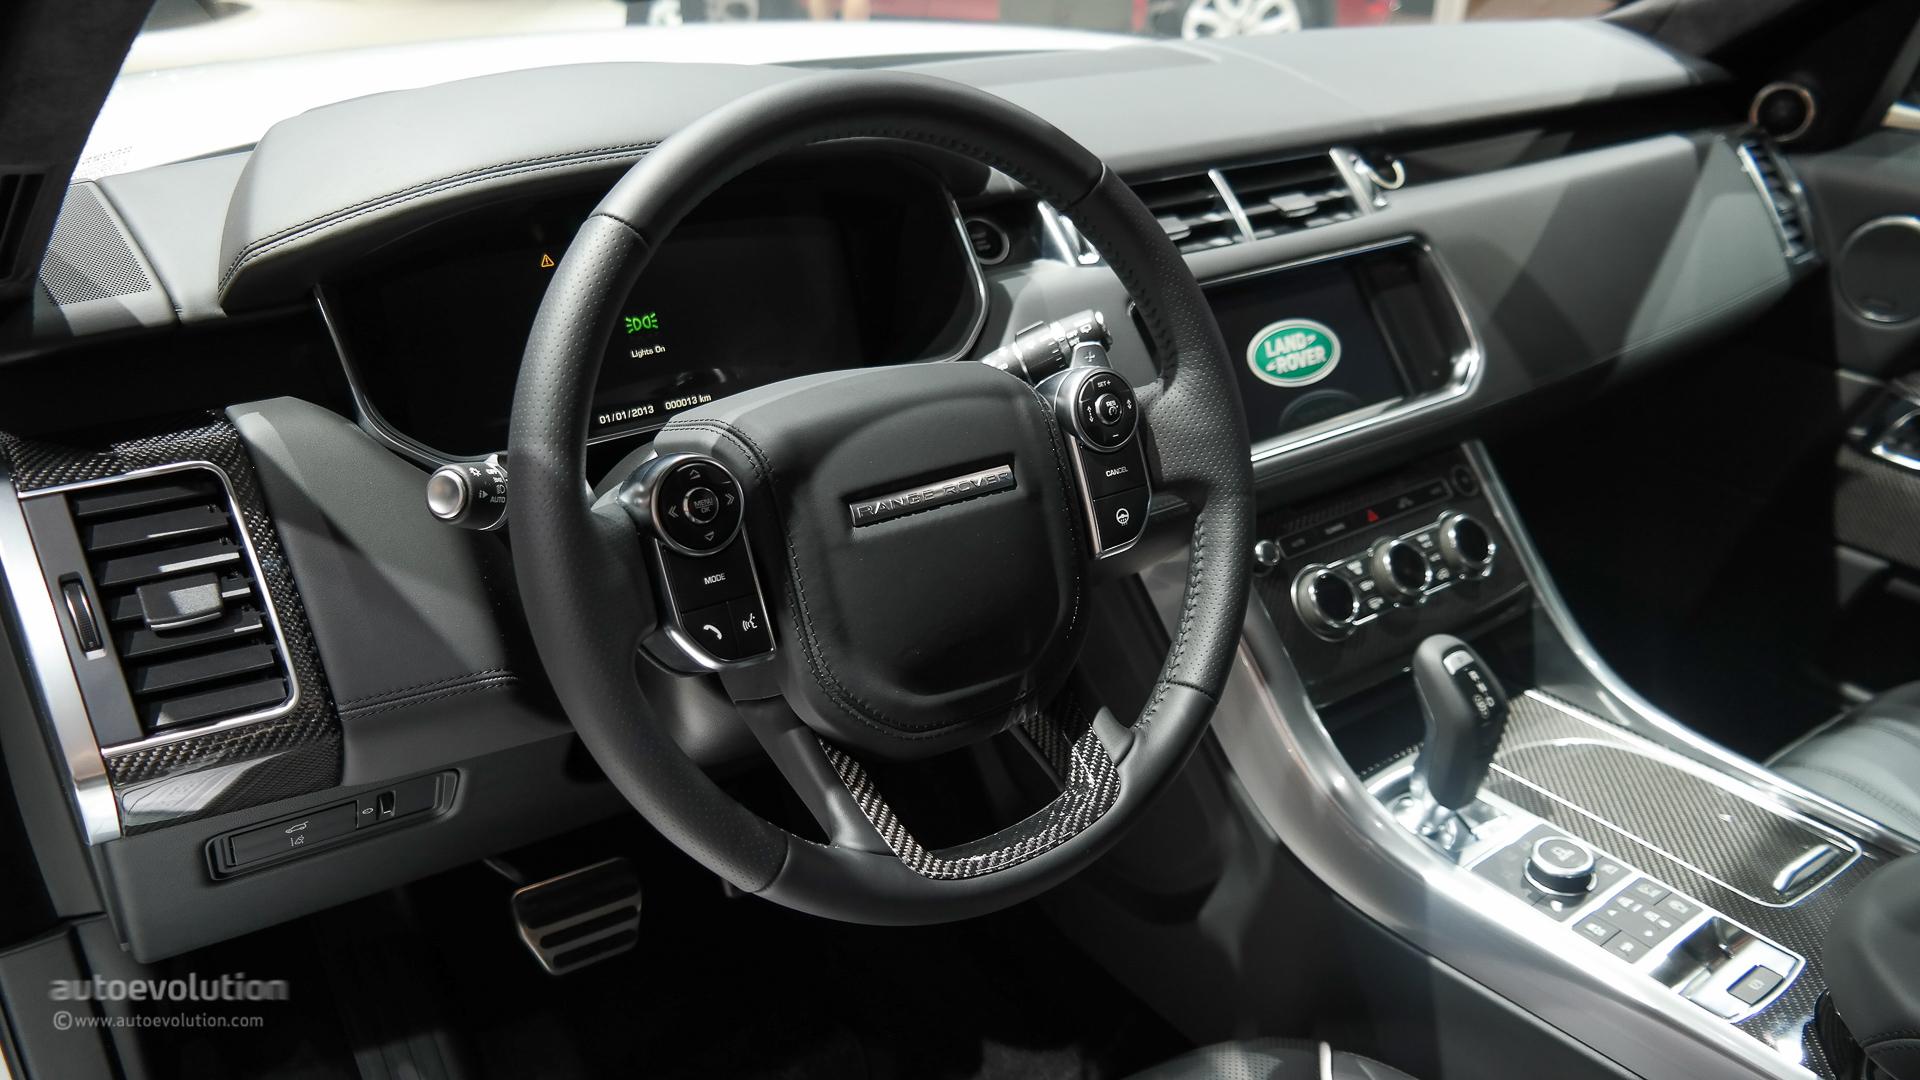 Land Rover Evoque Convertible >> Range Rover Sport SVR Brings Its Supercharged V8 to Paris [Live Photos] - autoevolution